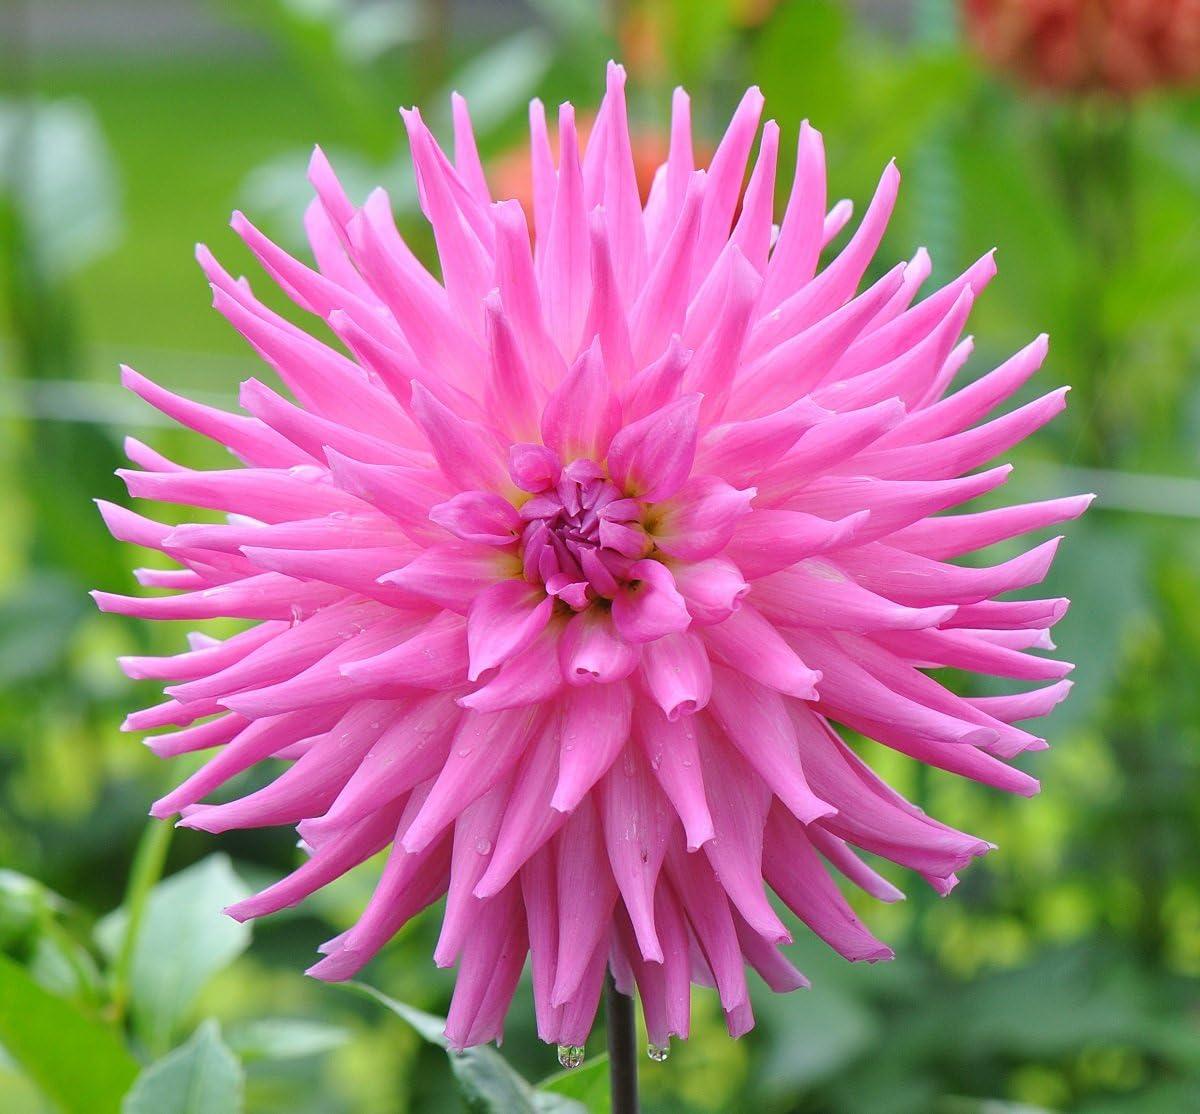 Blumenzwiebel//Knolle // Wurzel Georginen Cactus Pink Dahlien Dahlia